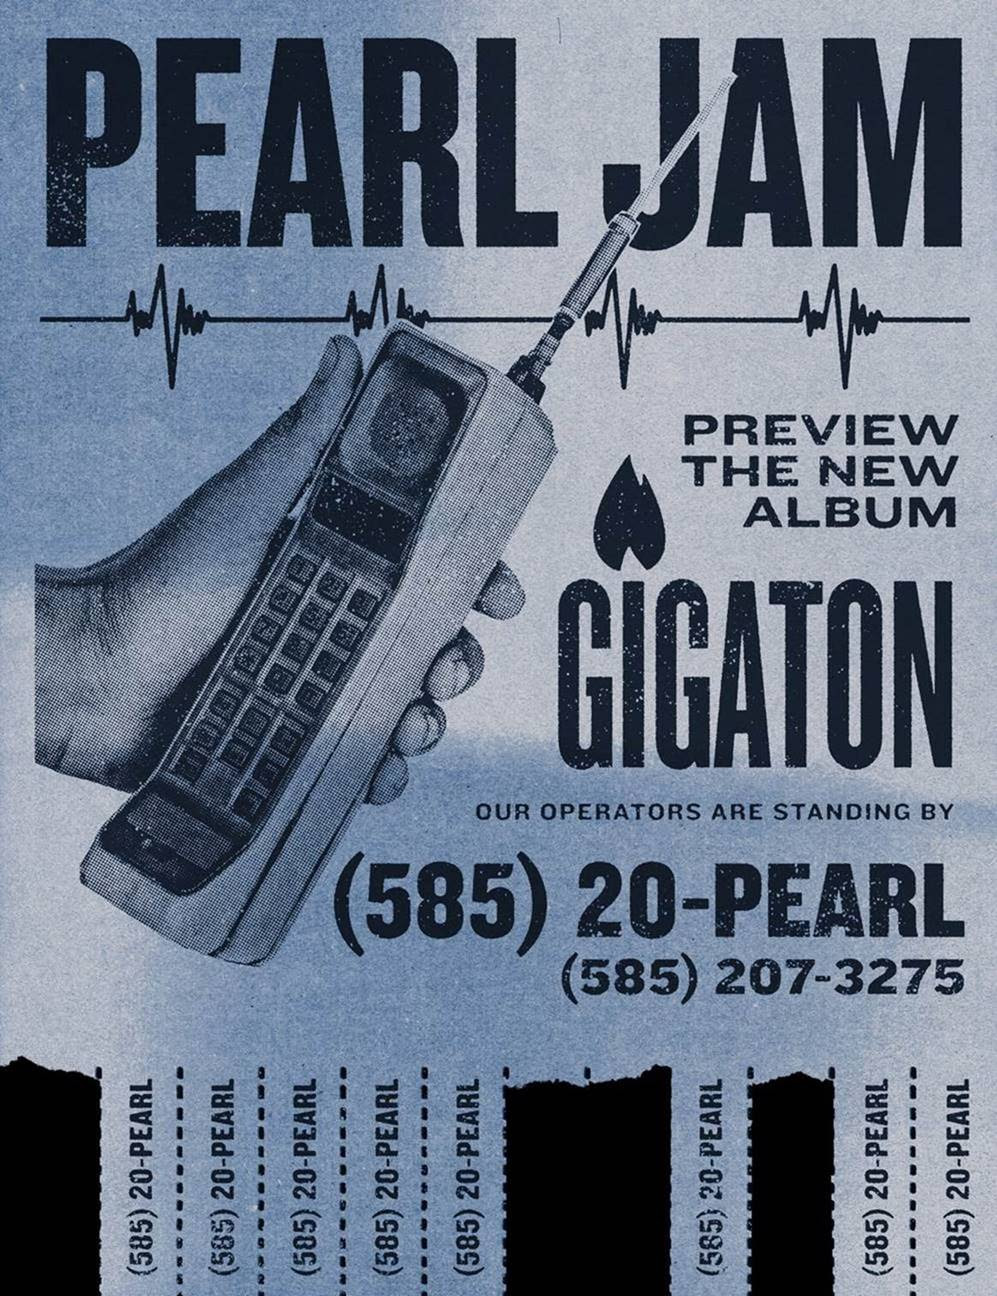 Pearl Jam Gigaton Hotline